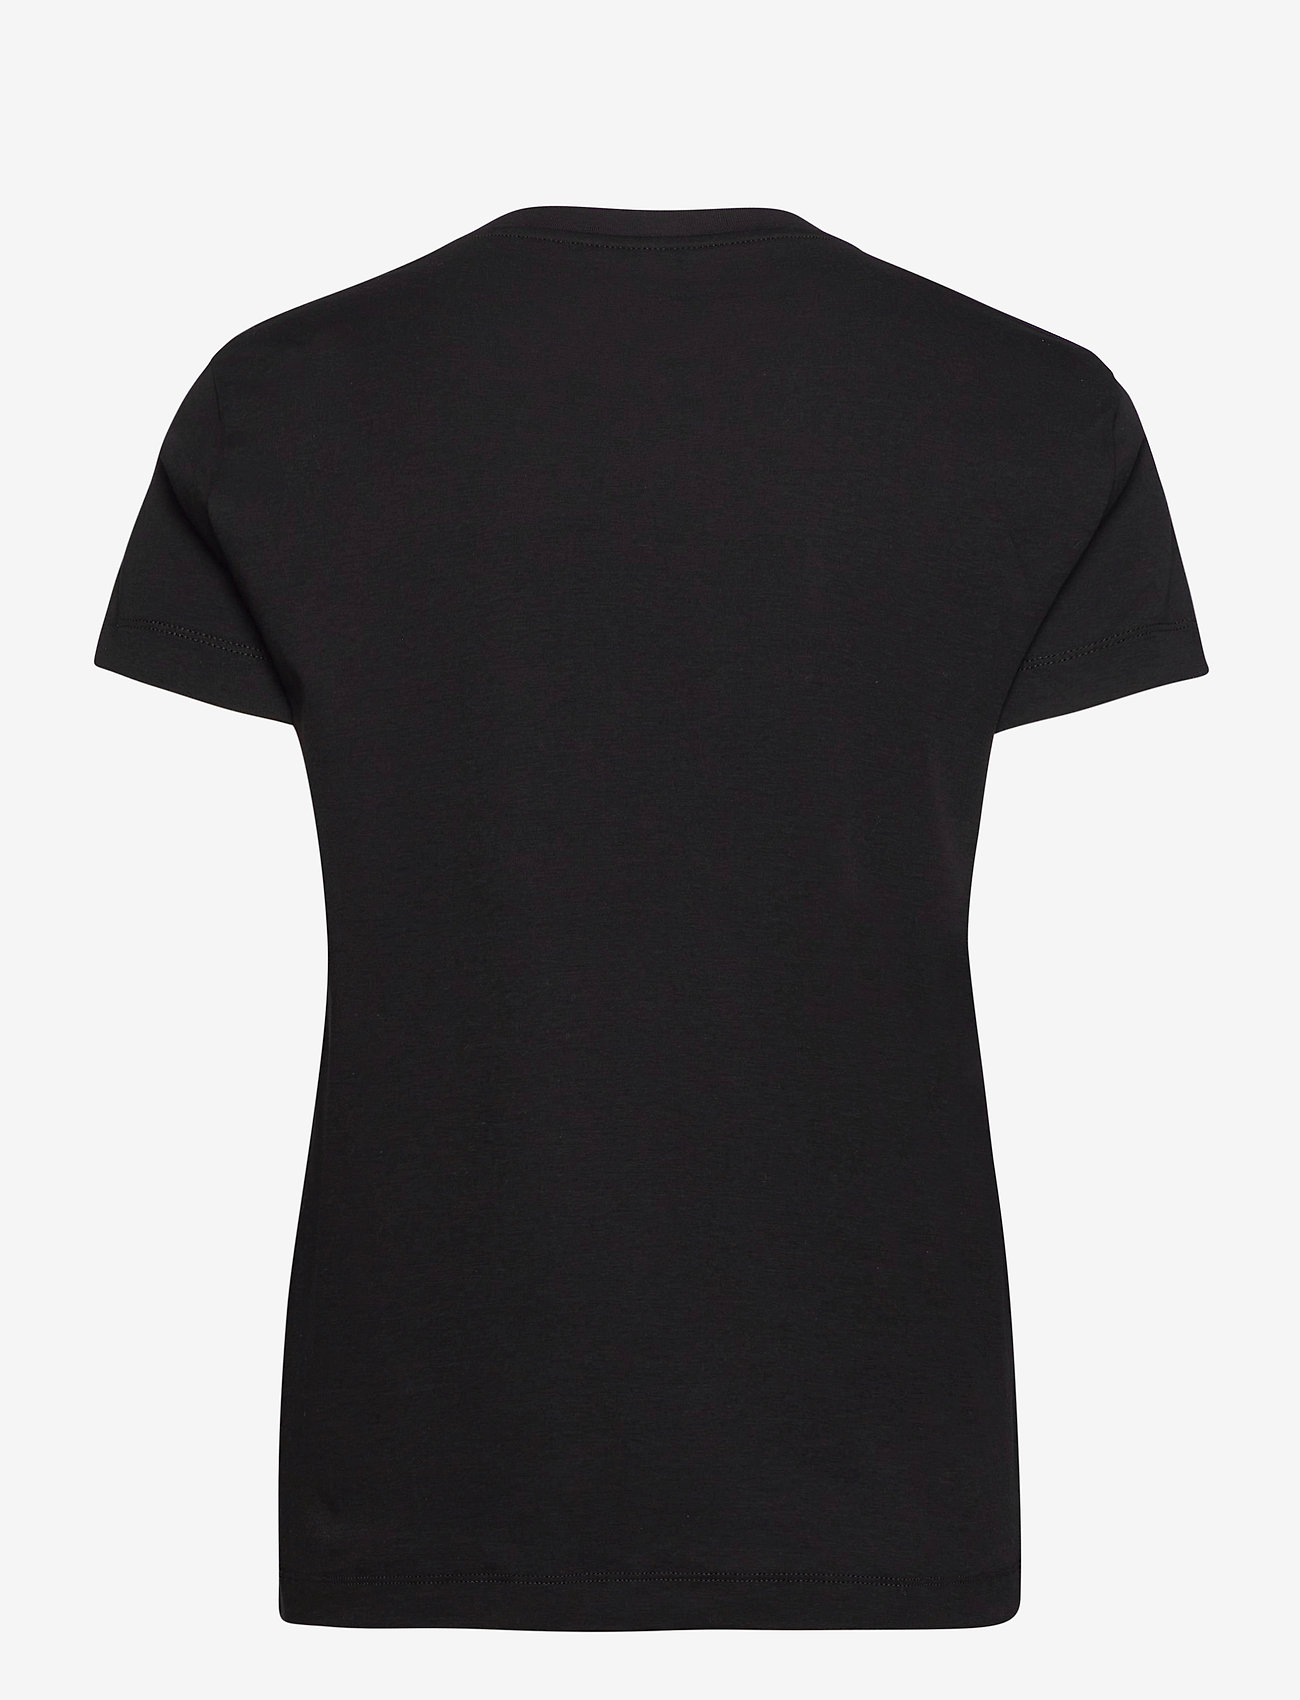 Zadig & Voltaire - WALK BLASON FLOCK PERM - t-shirts - black - 1